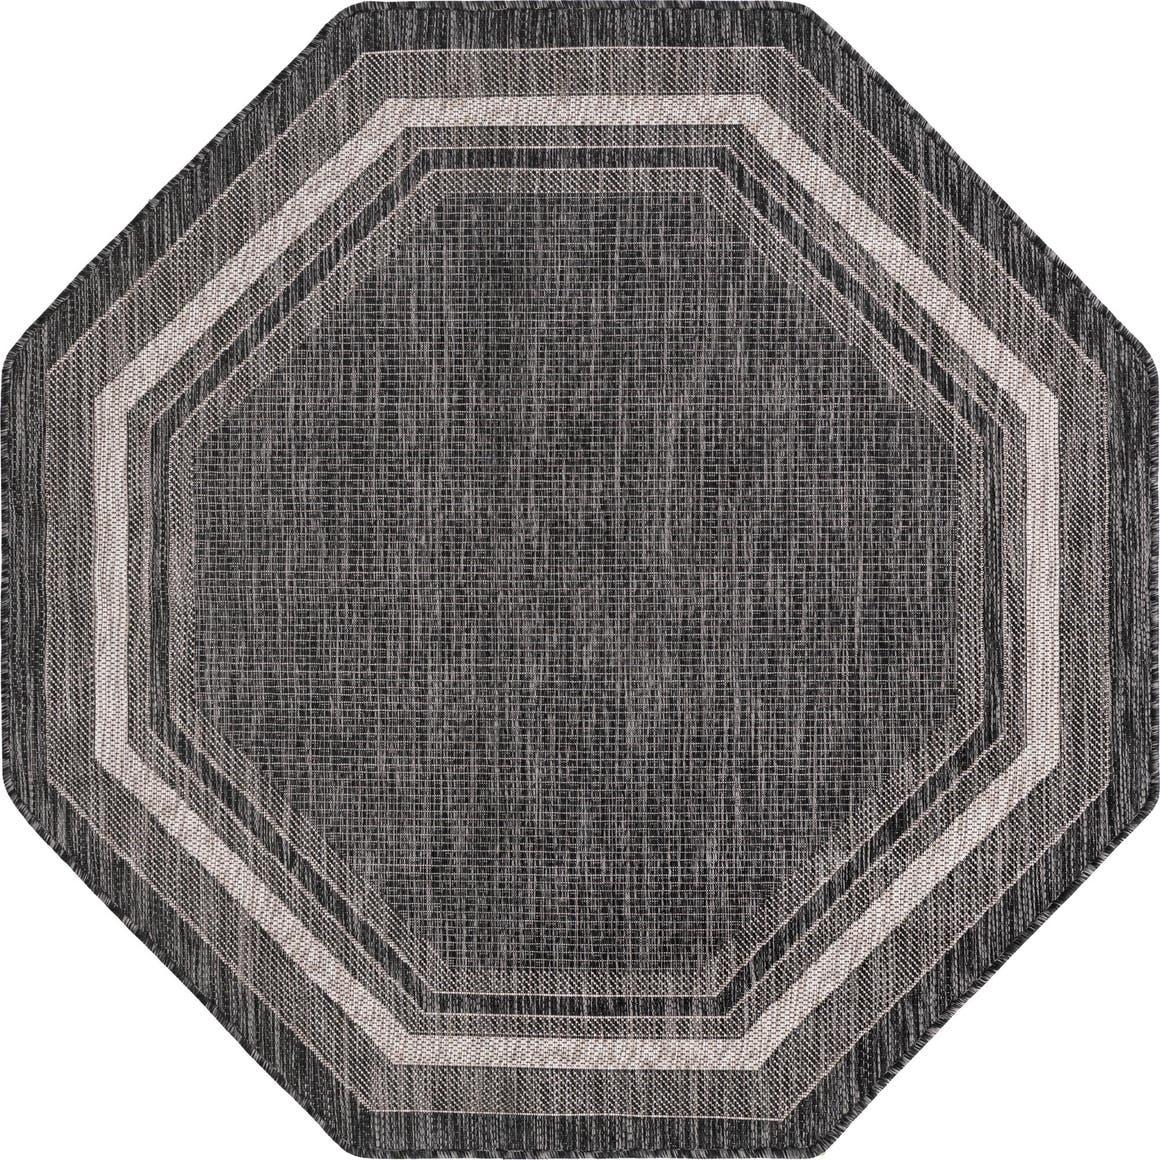 5' x 5' Outdoor Border Octagon Rug main image